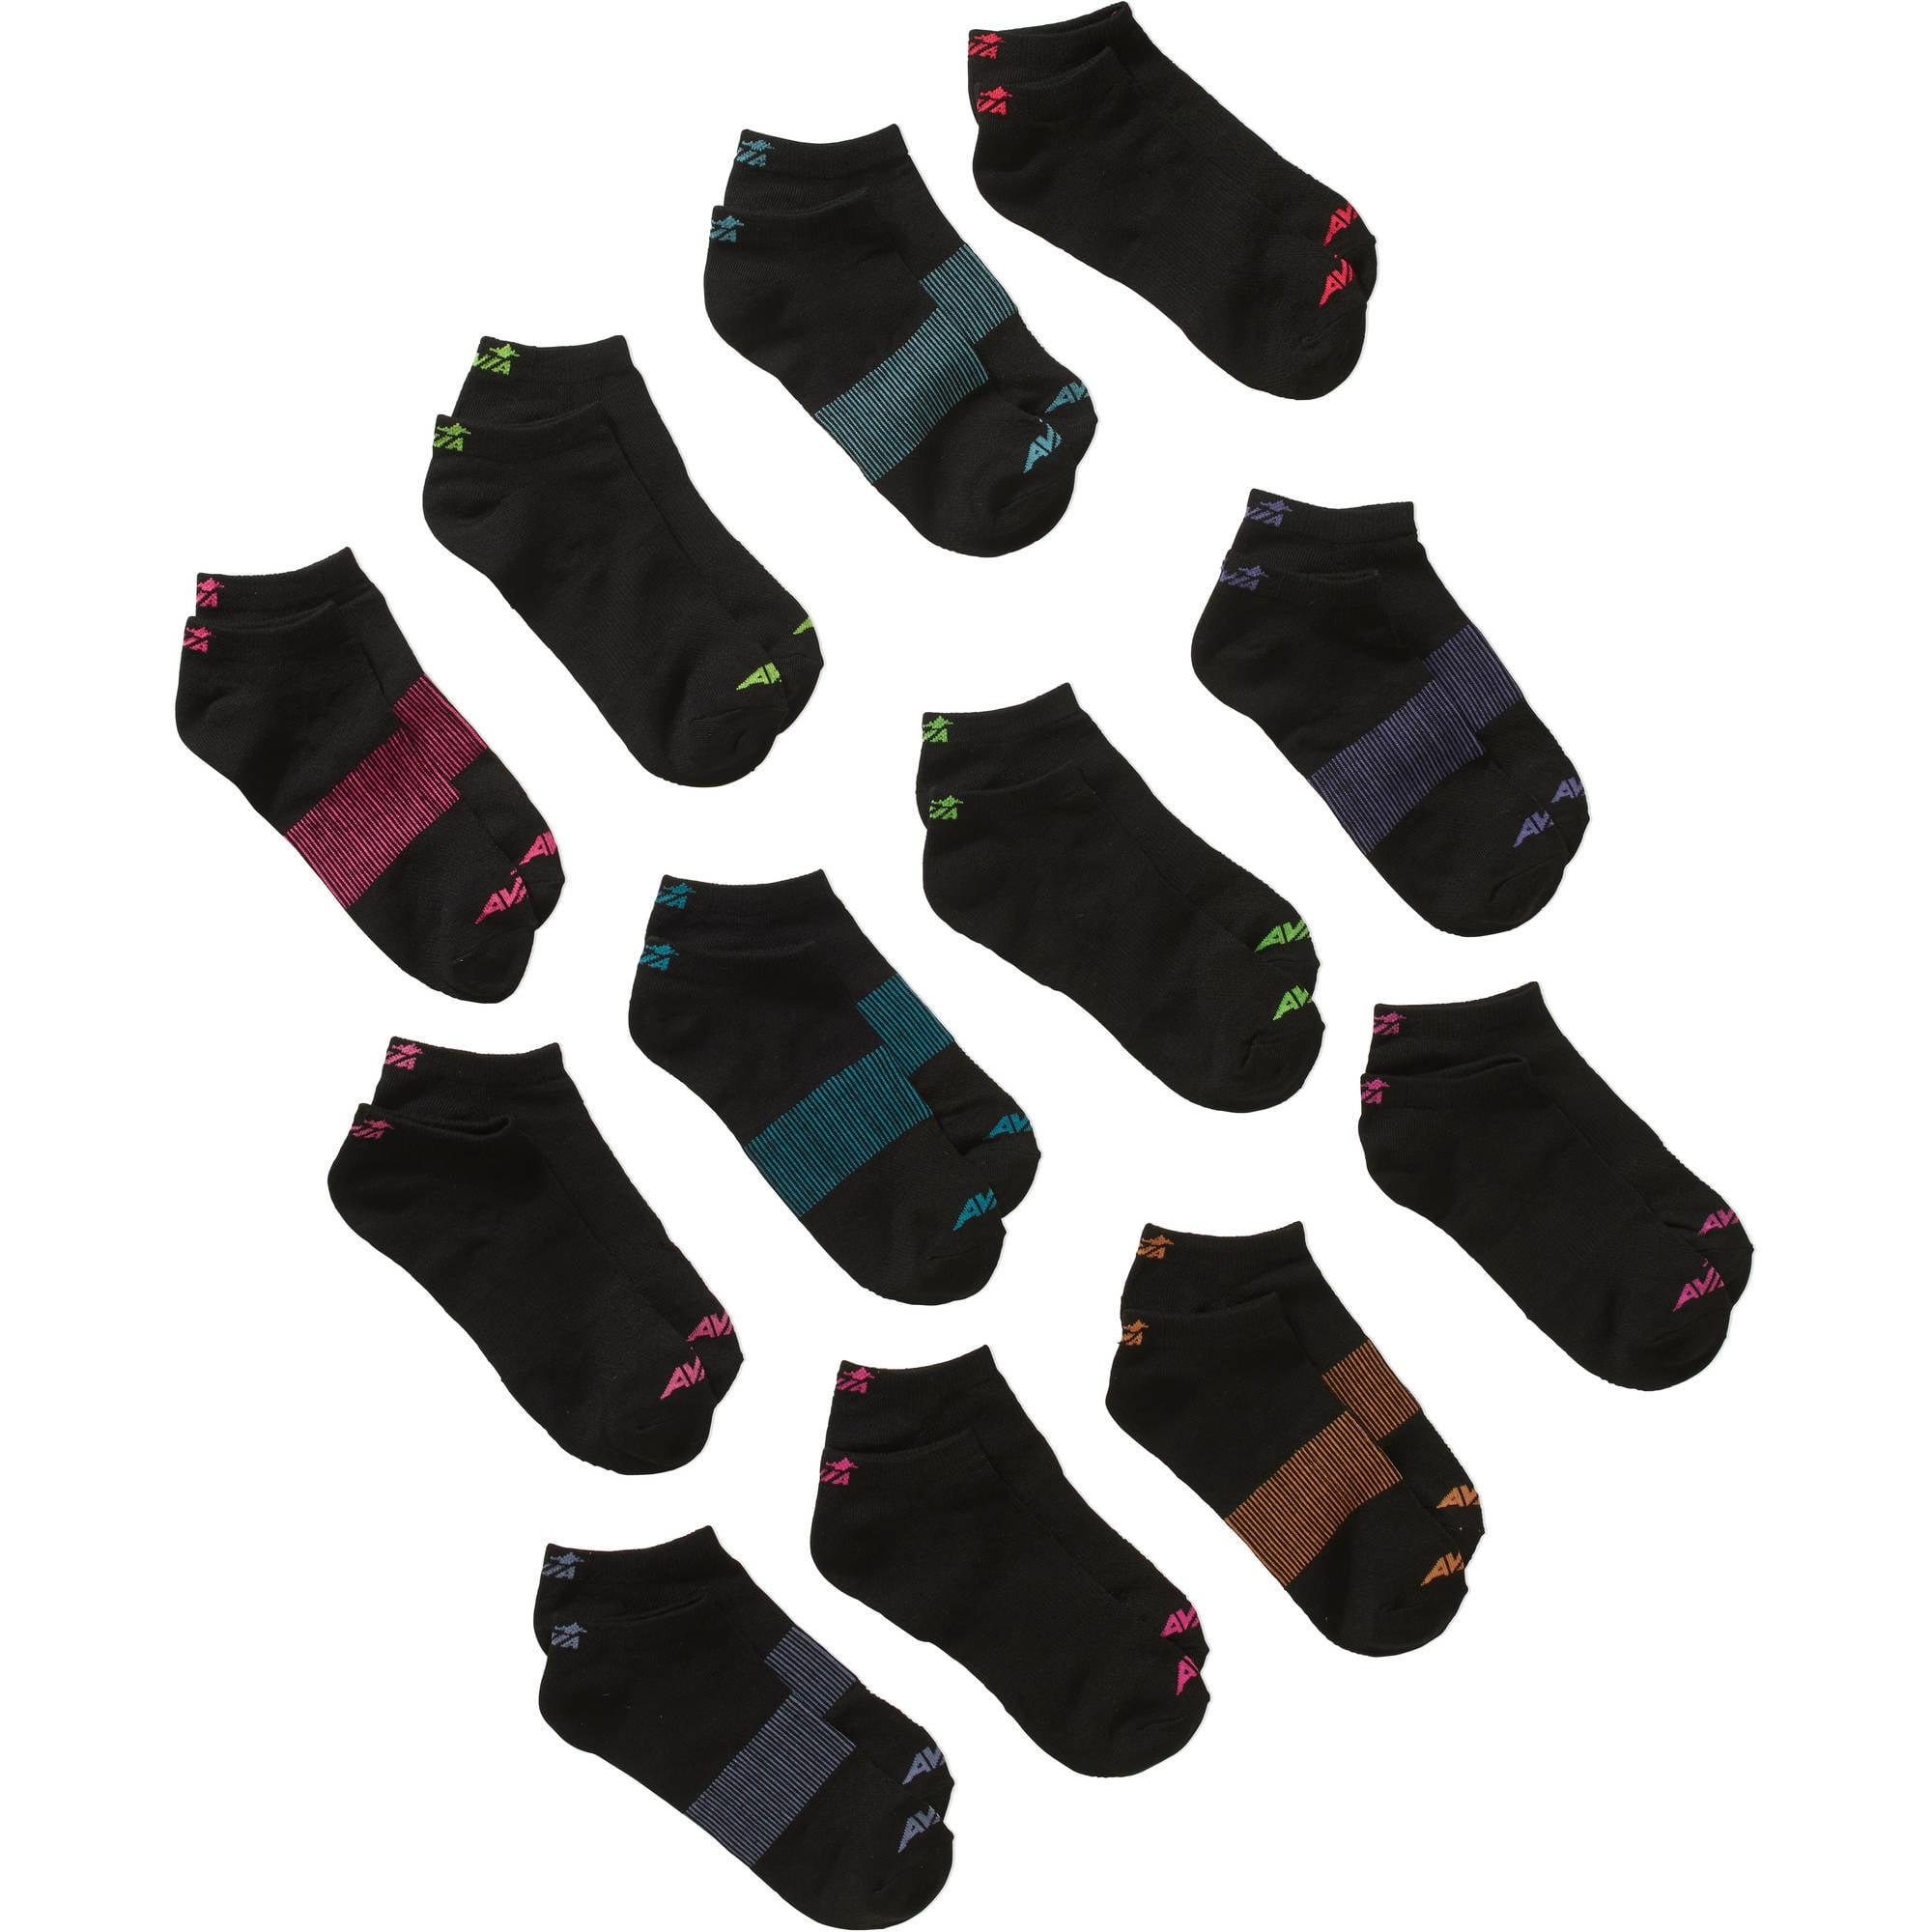 Avia Ladies Performance Liner No Show Socks, 12 Pack